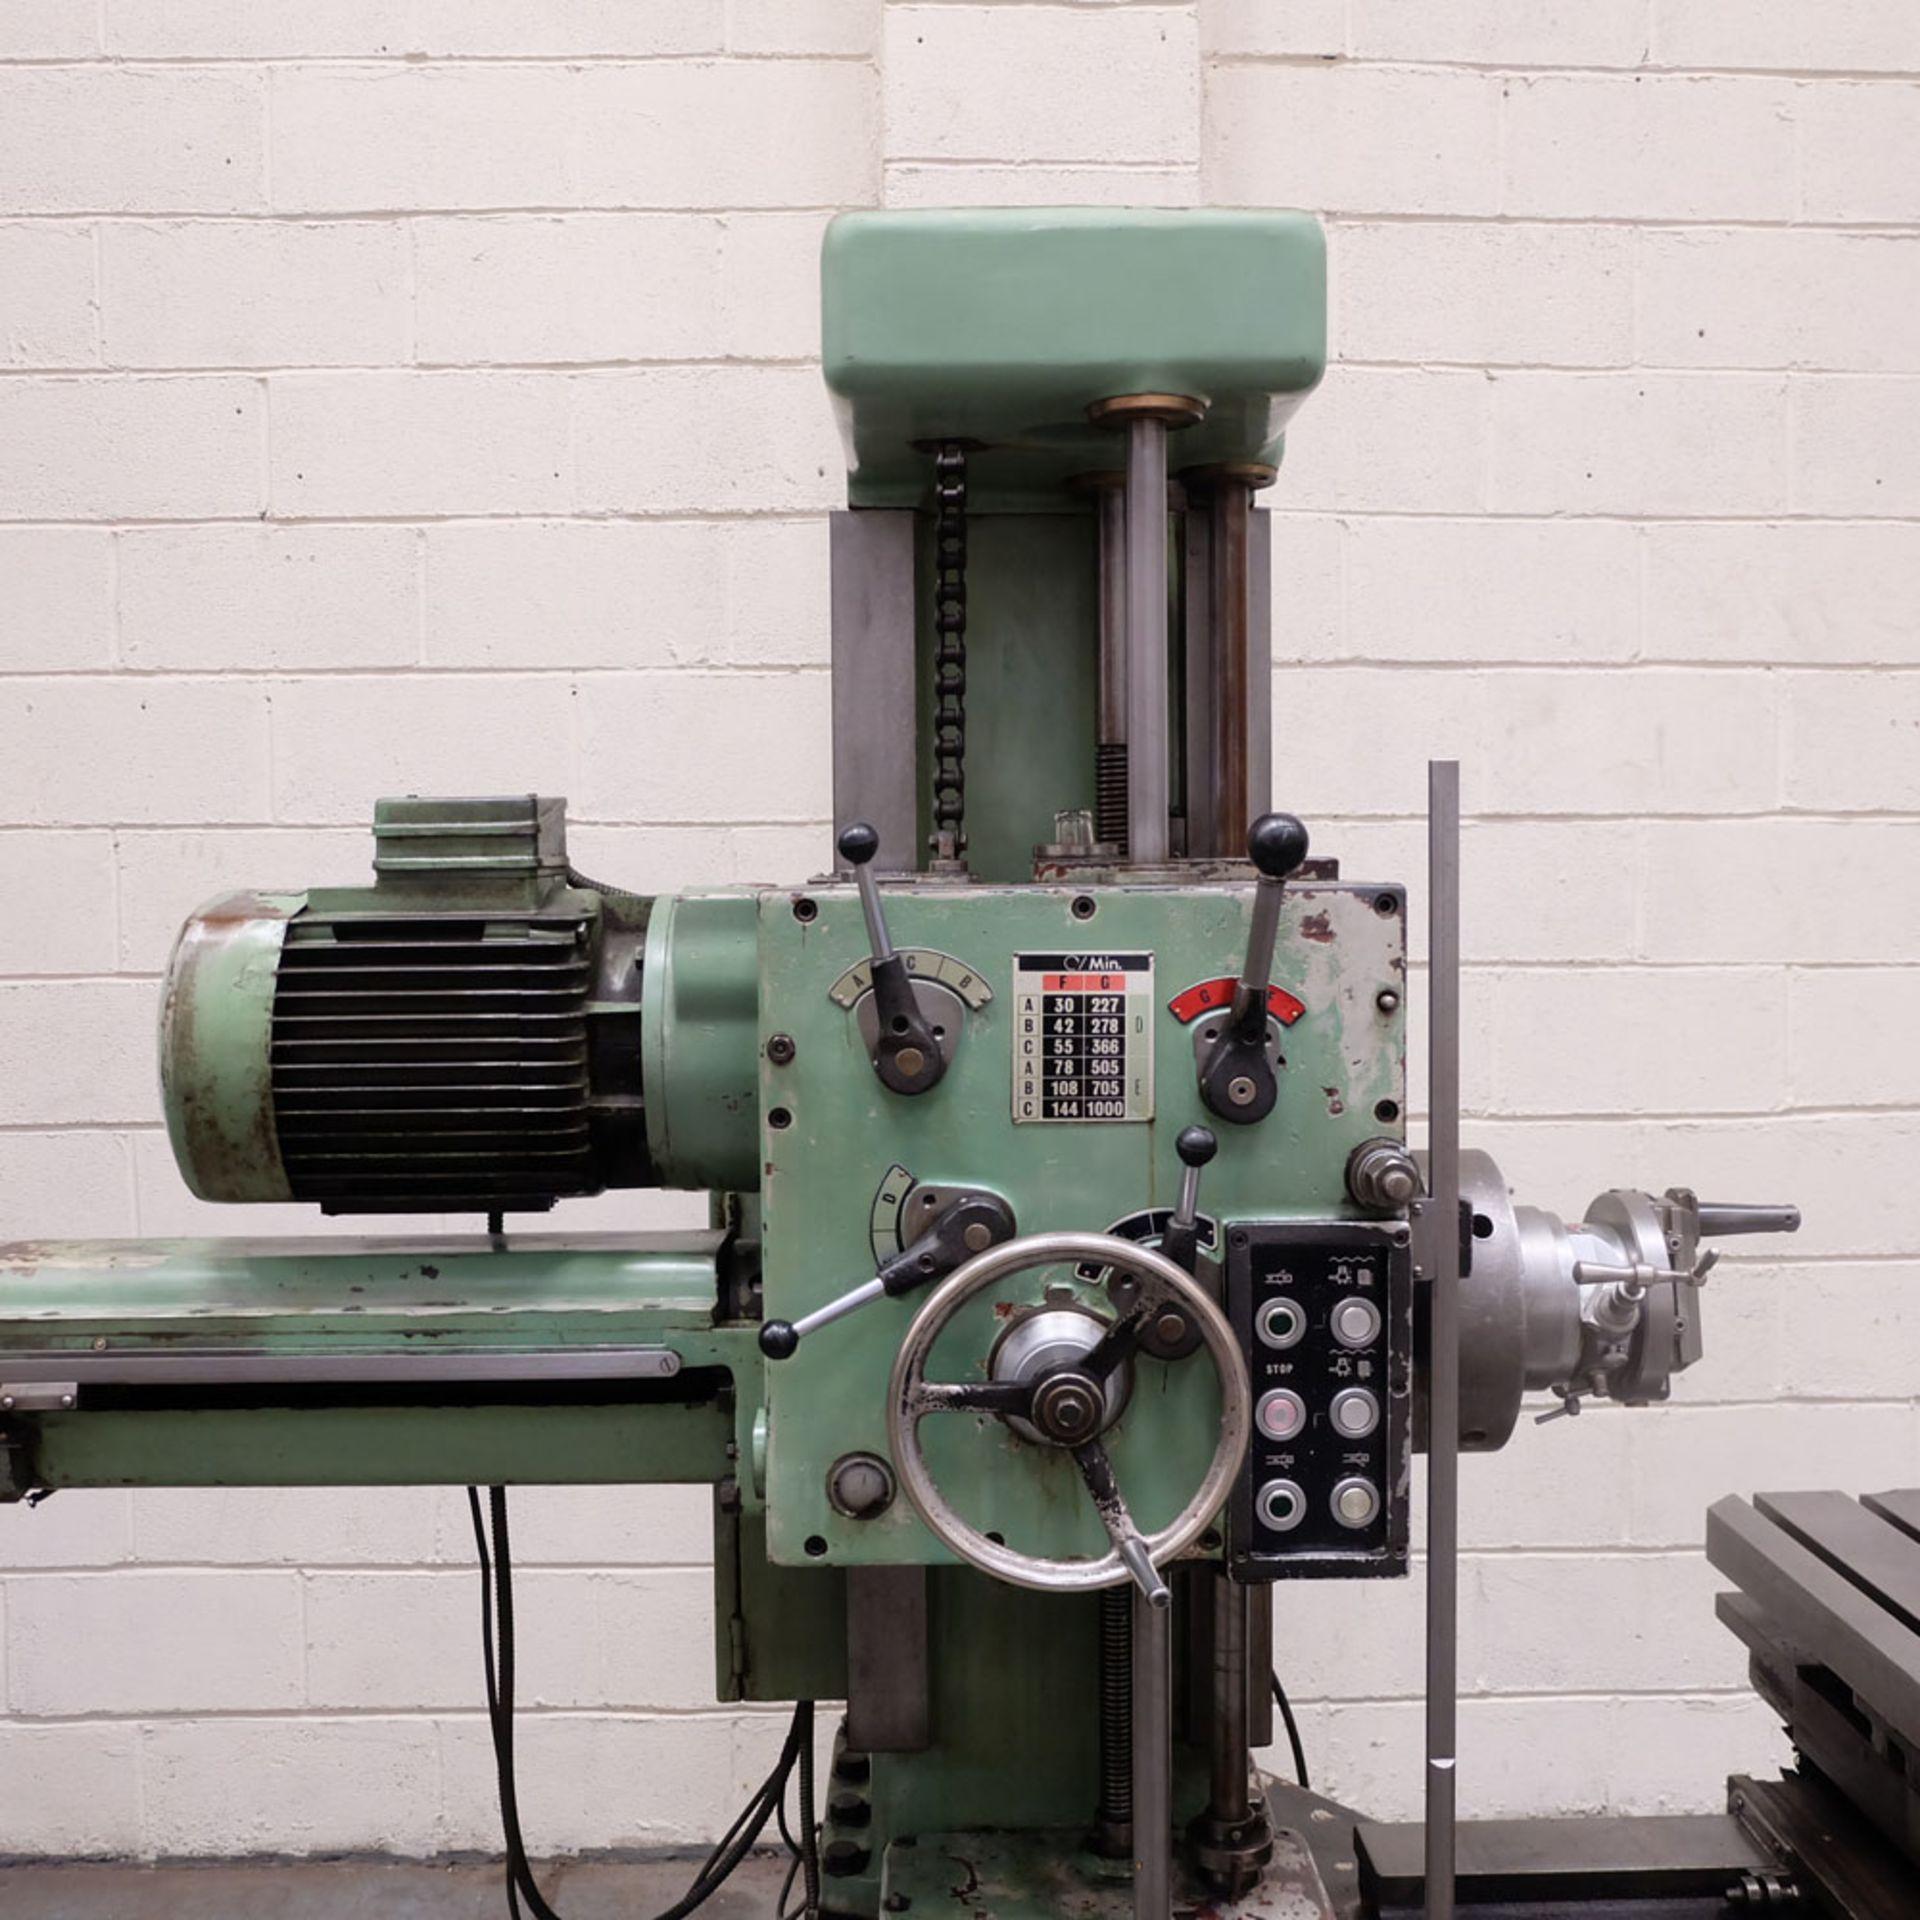 Juaristi Model MDR-55 Horizontal Boring Machine. Spindle Size: 55mm Dia. Spindle Bore: No.4 MT. - Image 3 of 14